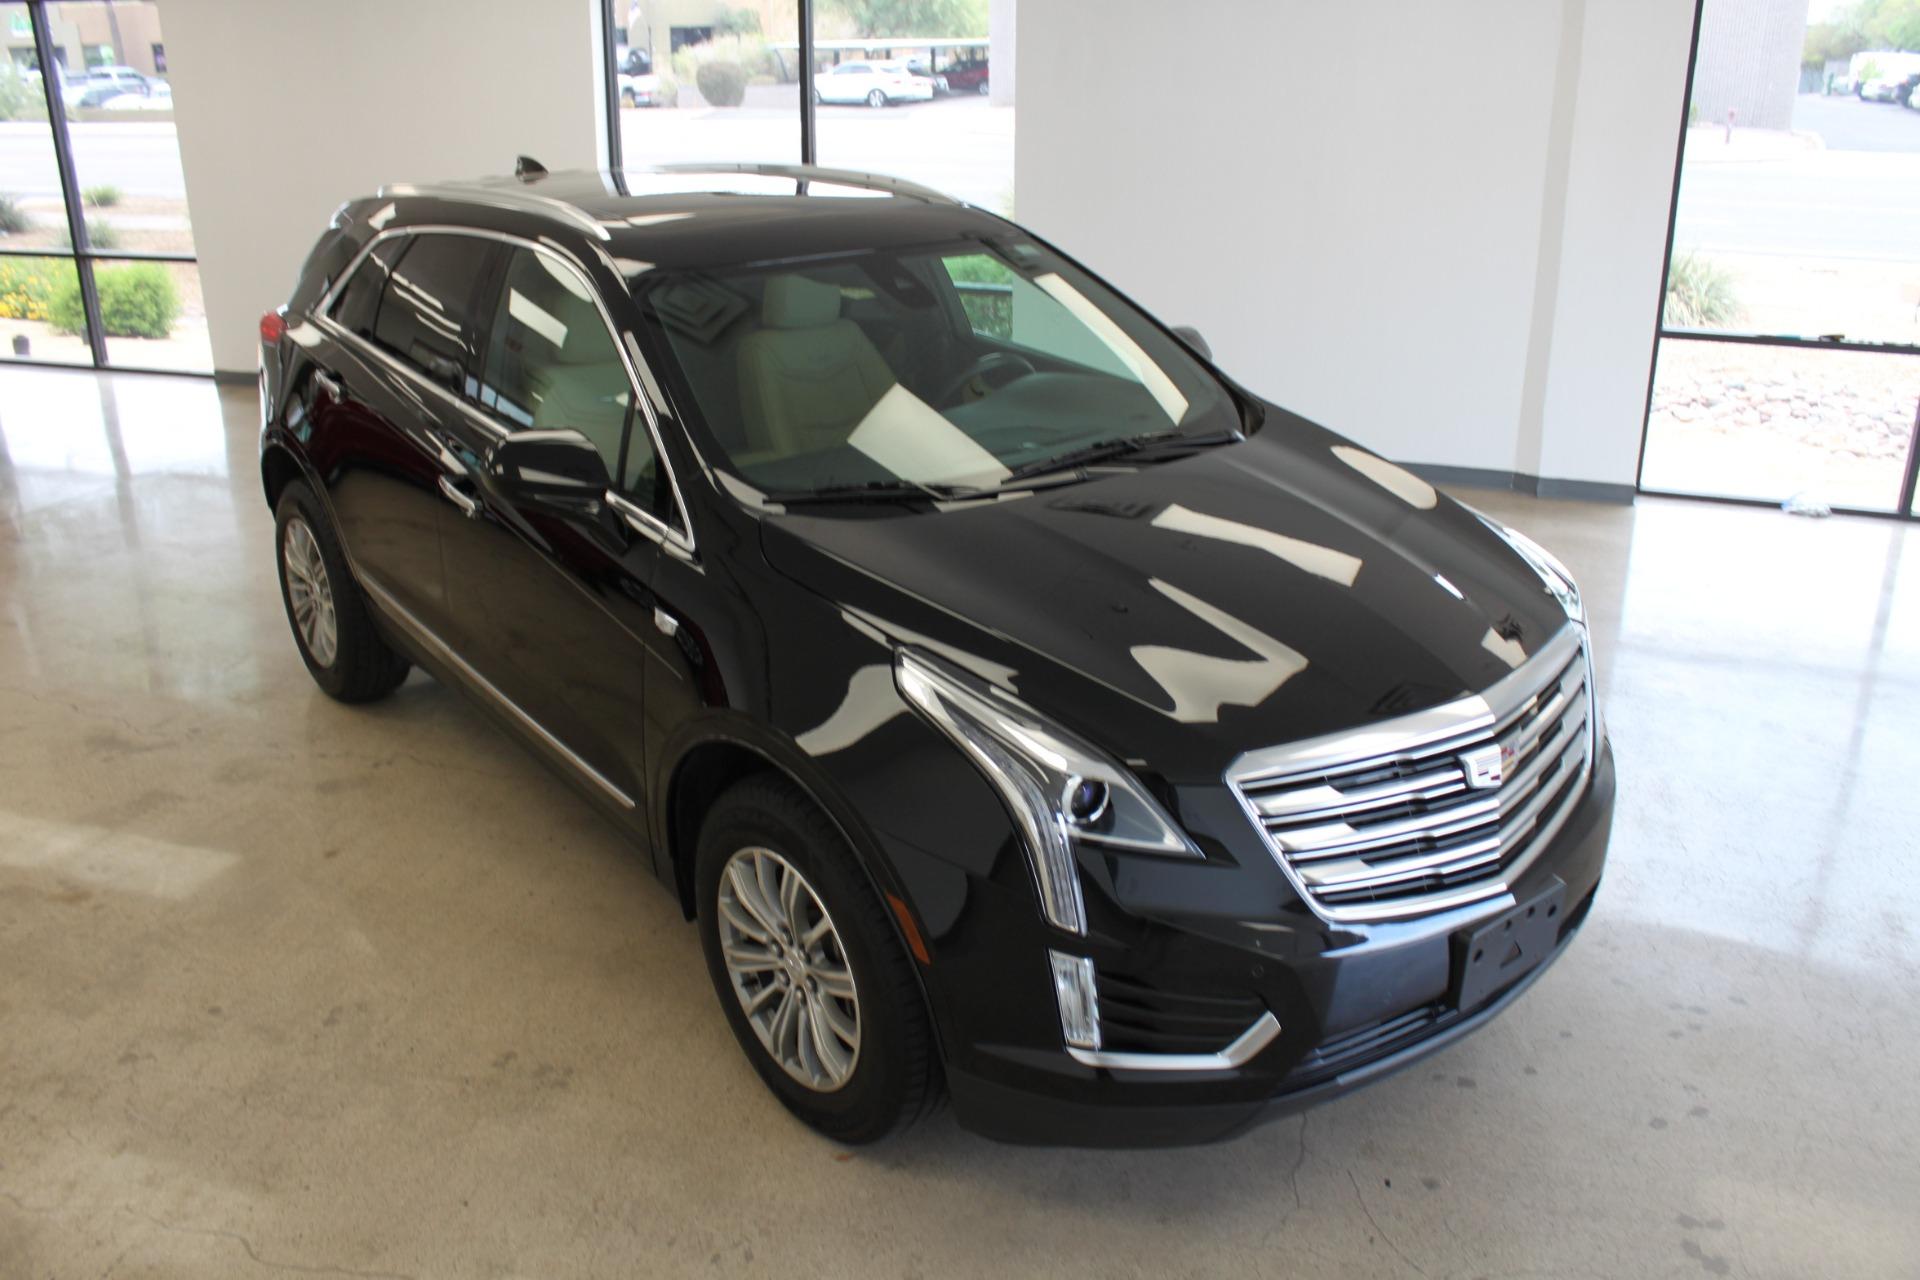 Used-2017-Cadillac-XT5-Luxury-All-Wheel-Drive-Luxury-AWD-Toyota